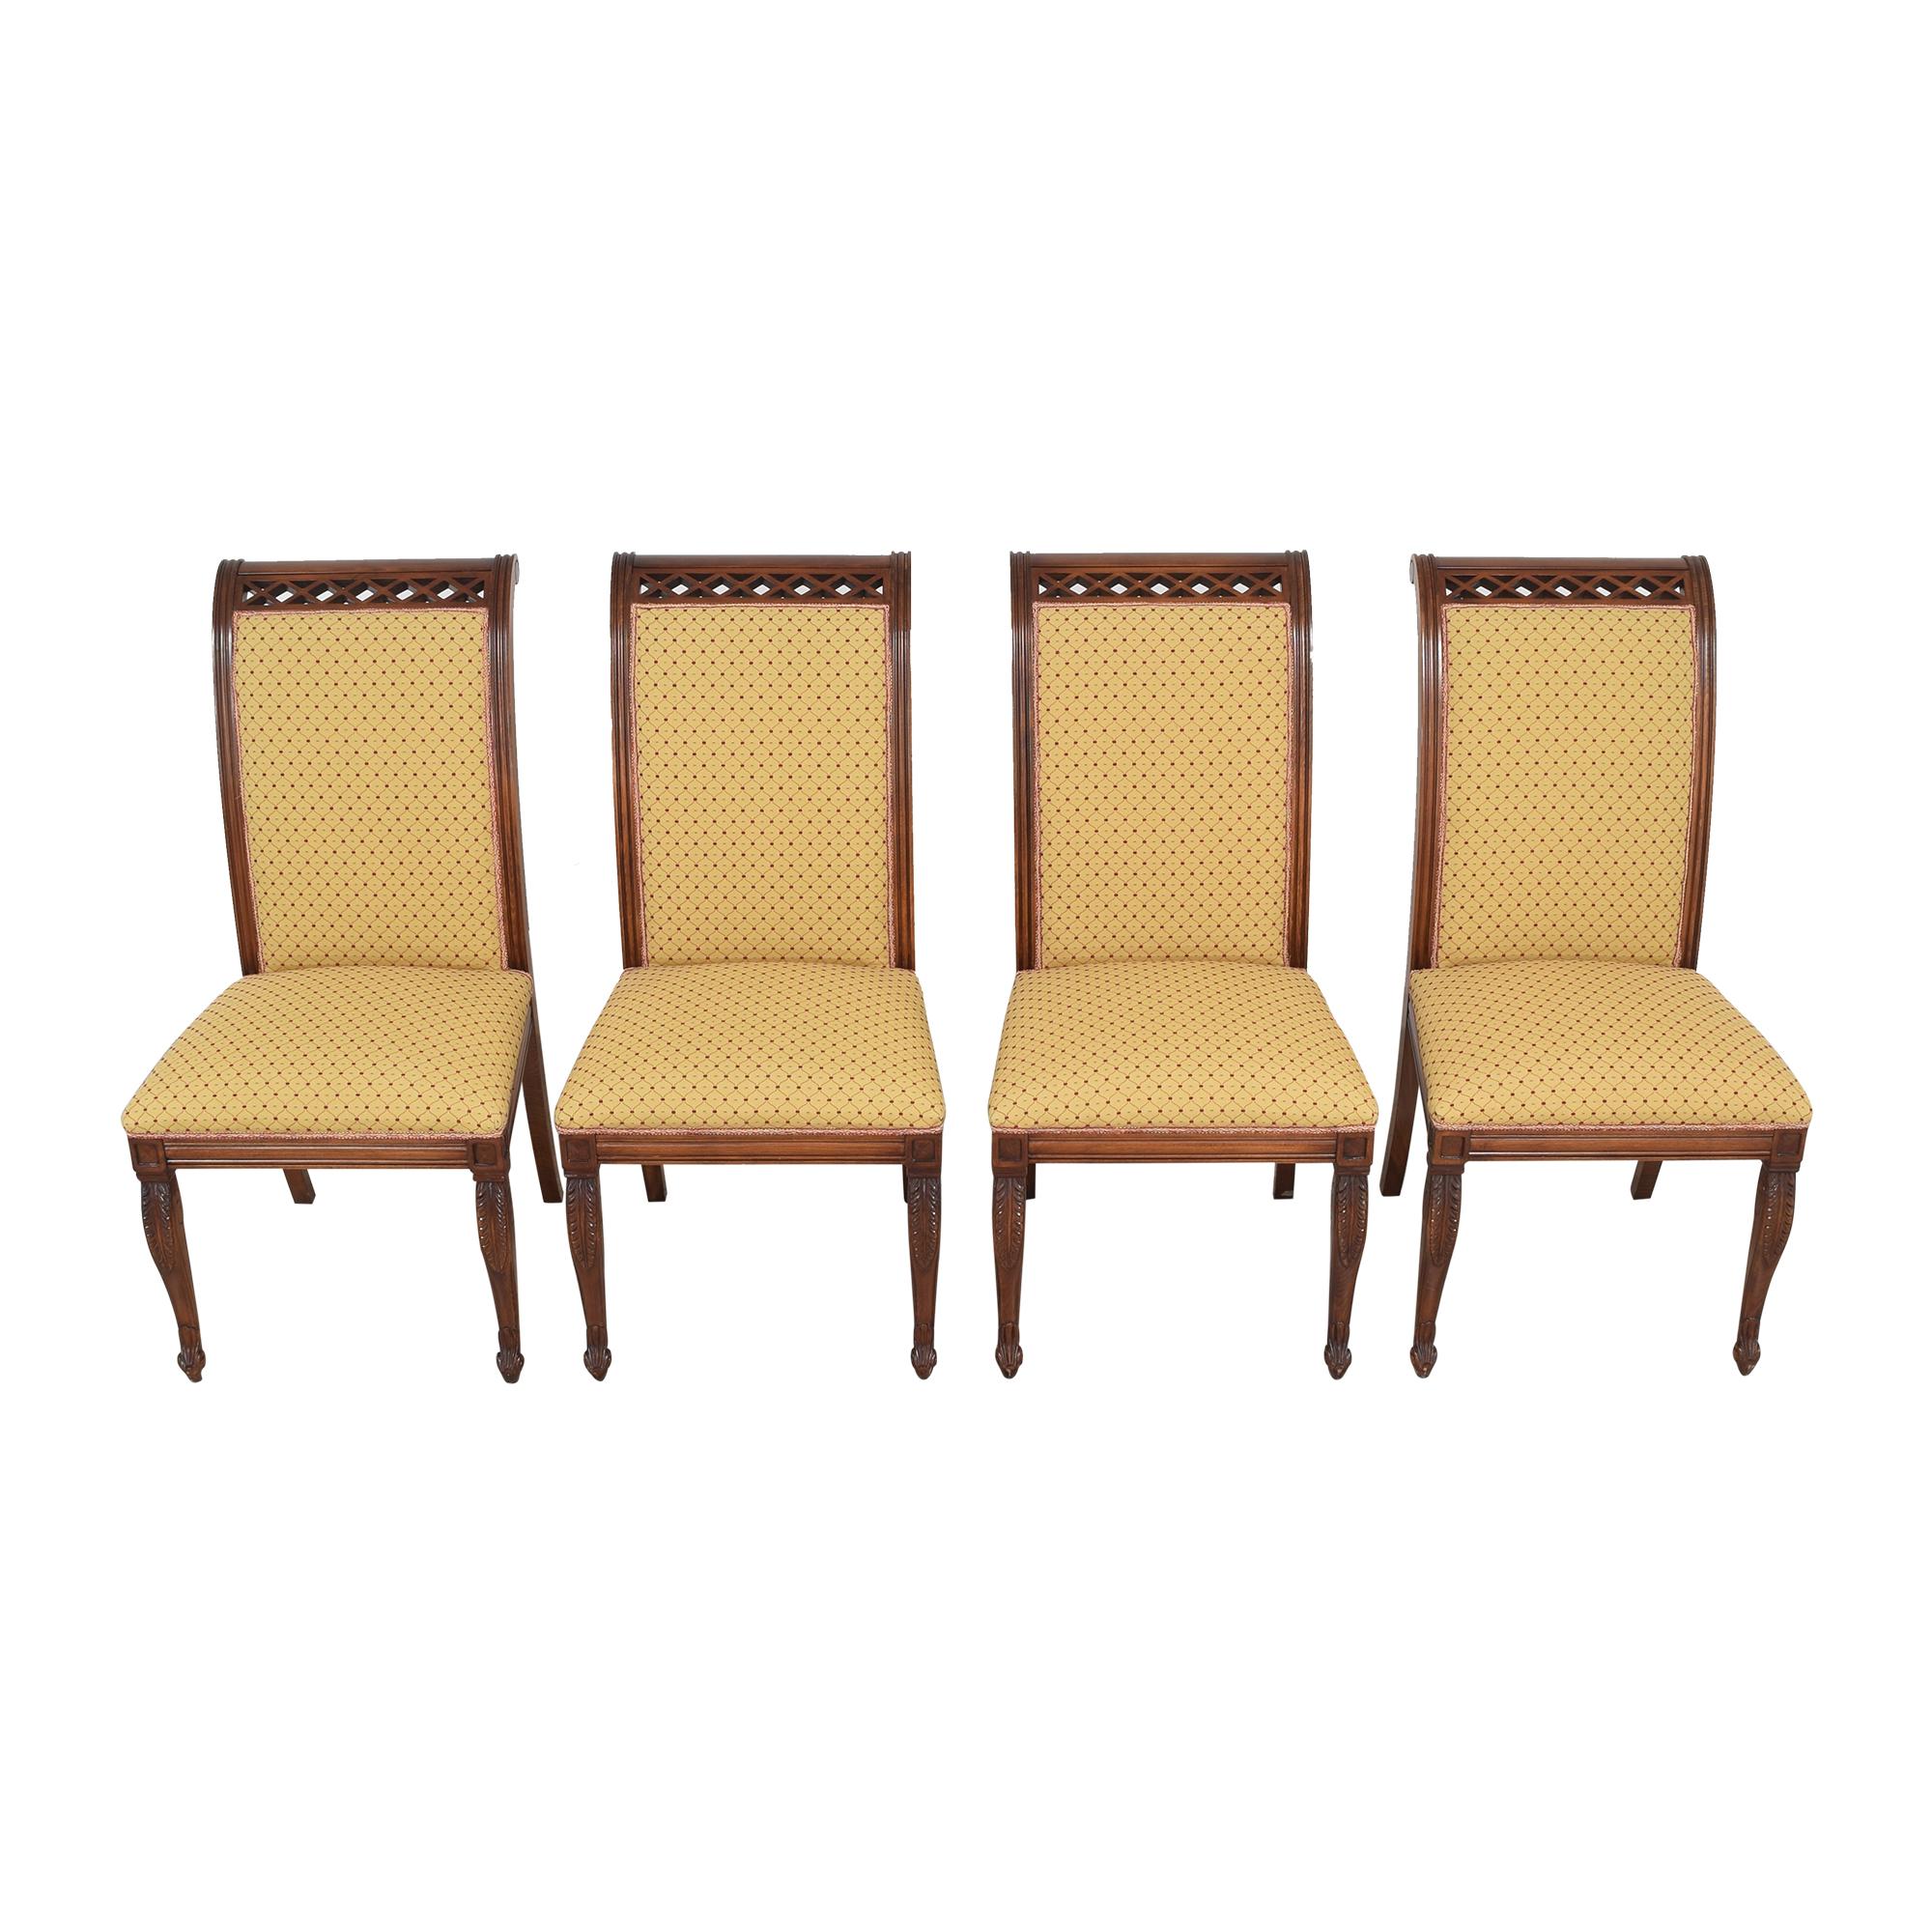 shop KPS Furnishings Custom Dining Chairs KPS Furnishings Chairs